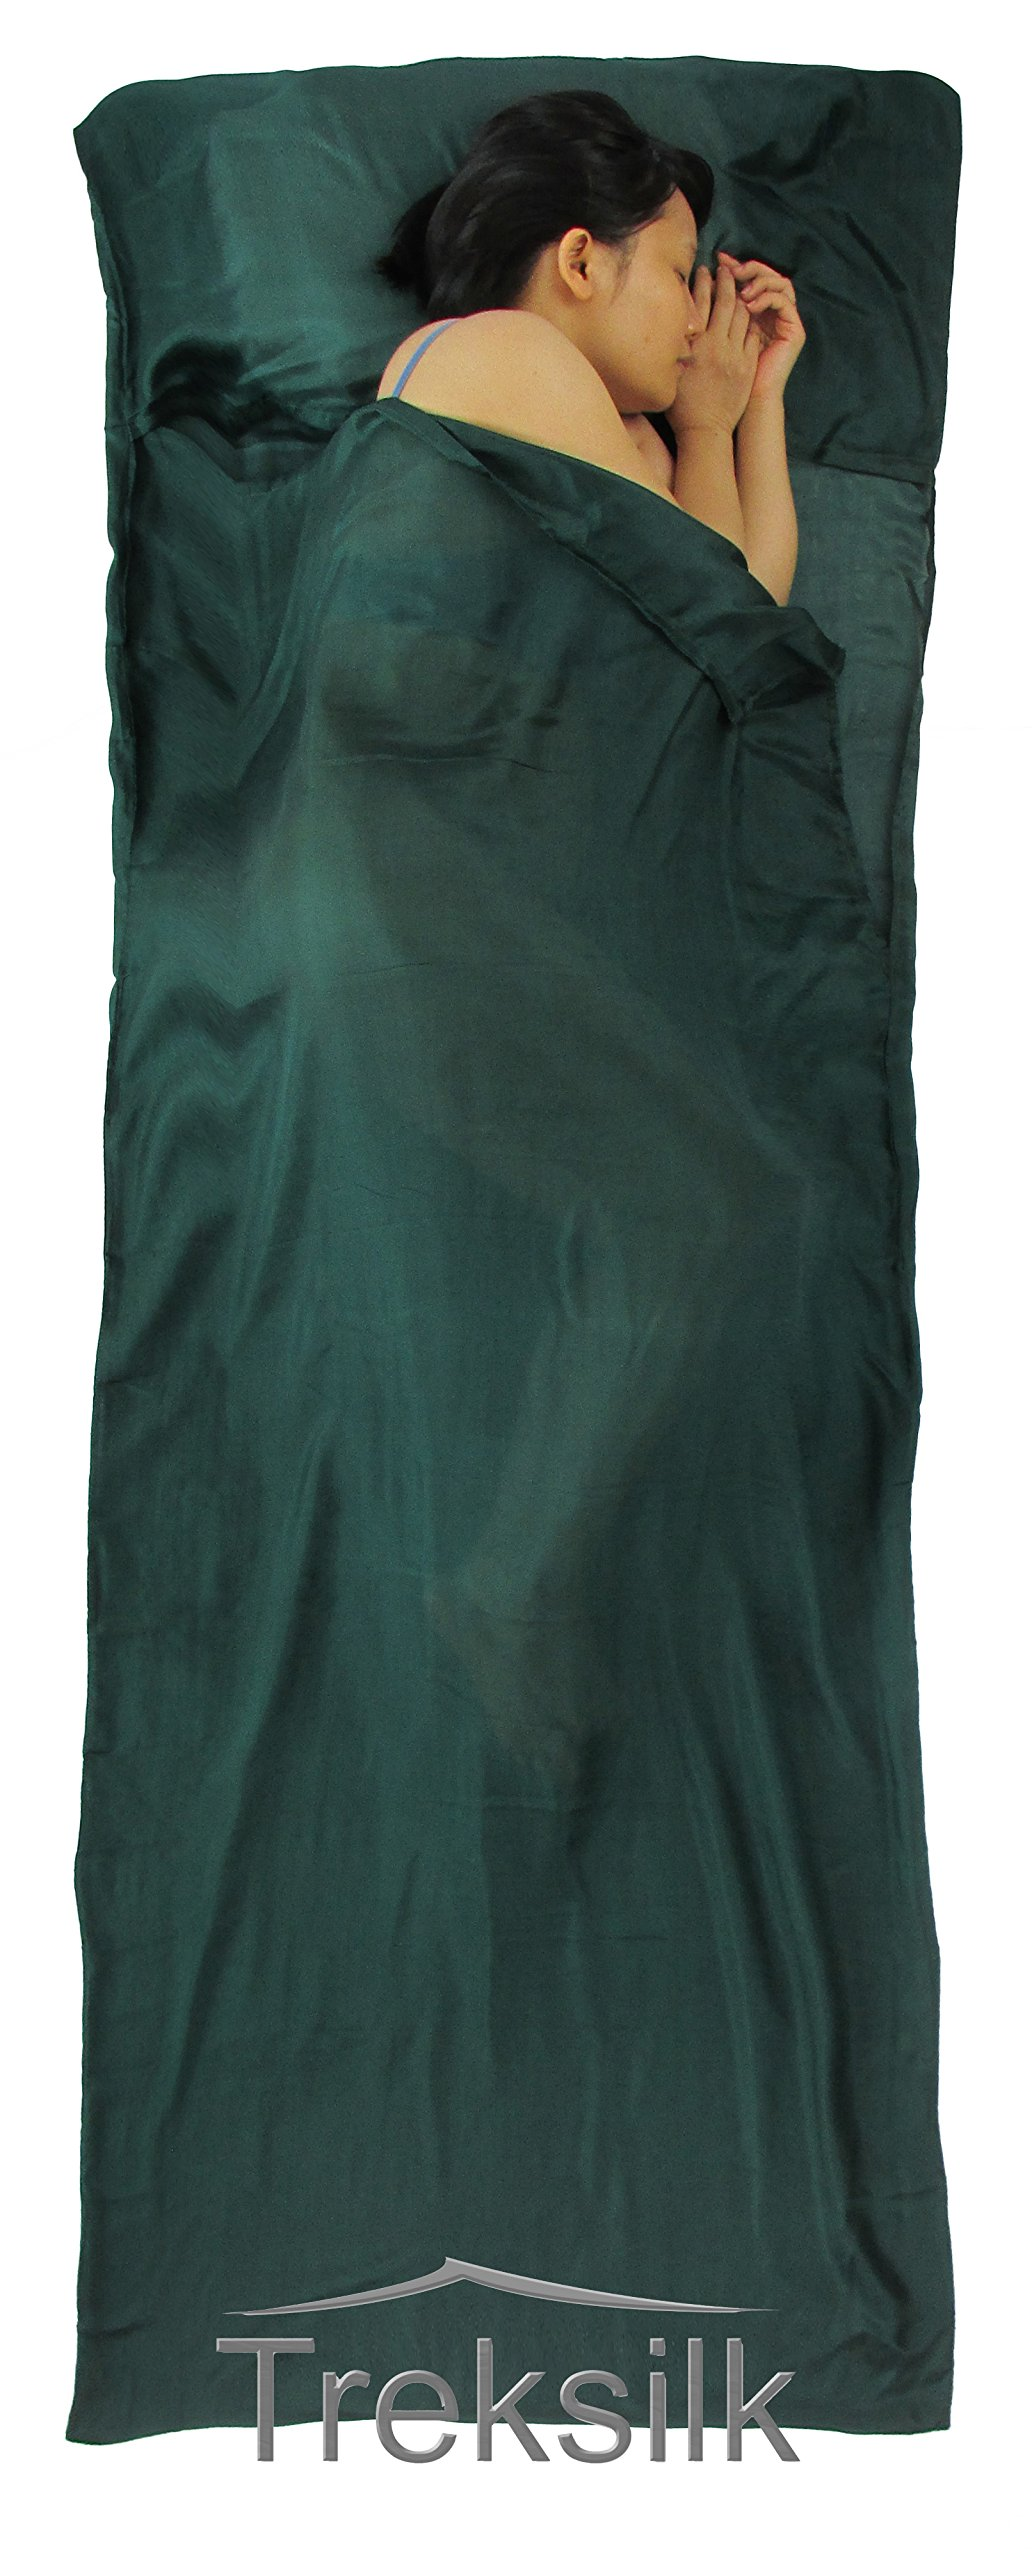 Treksilk: 240 cm! 100% Mulberry Silk Single Sleeping Bag Liner Travel Sheet Sack (Dark Green) by Treksilk